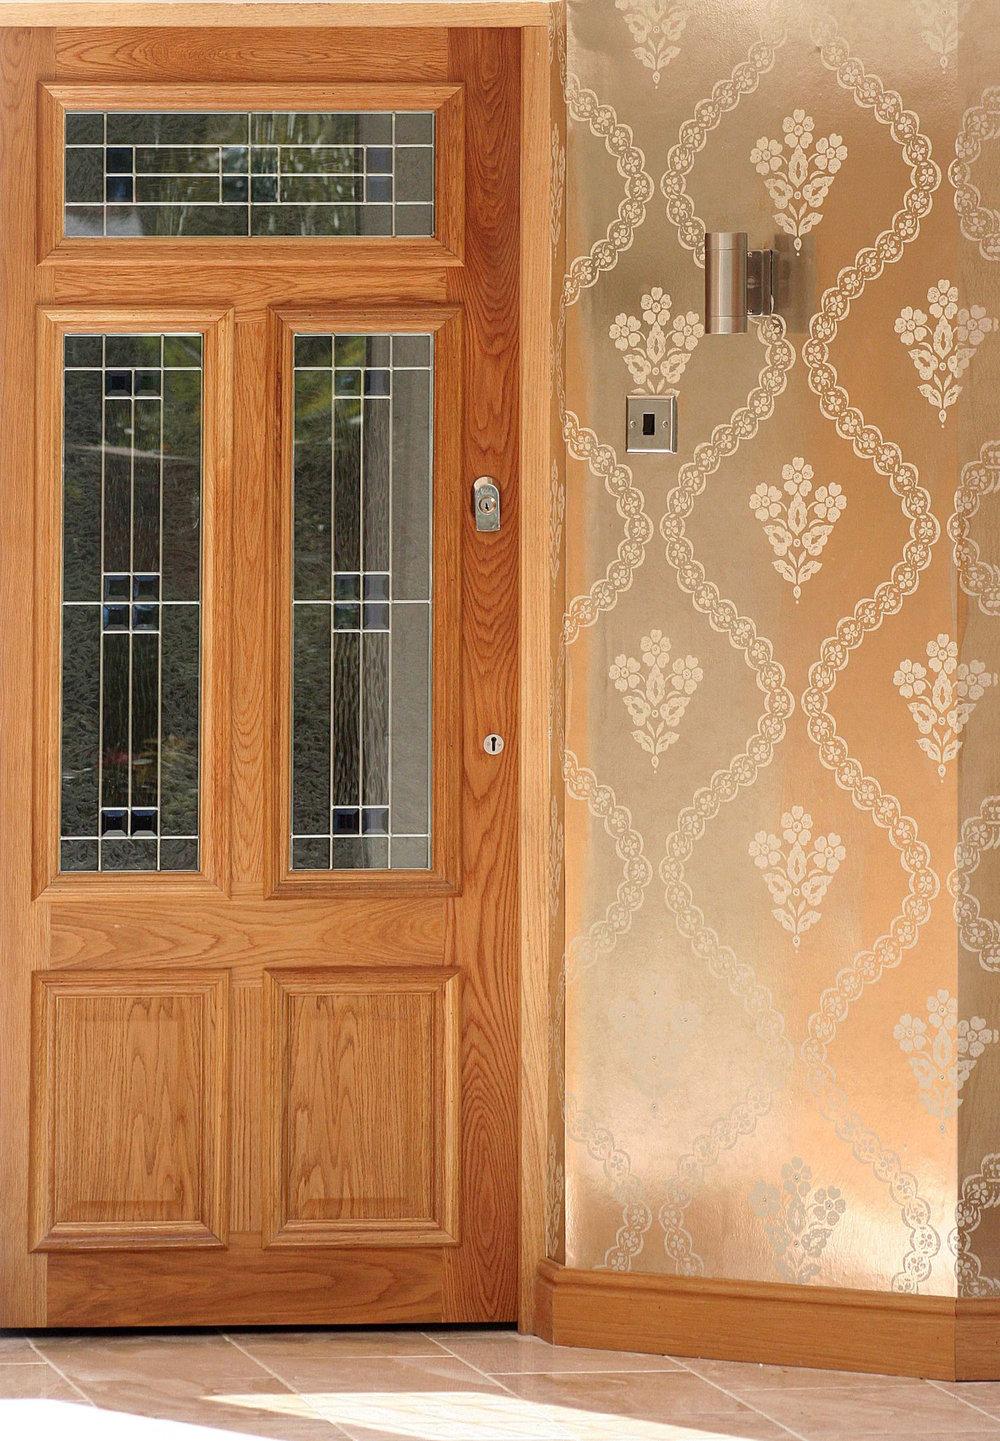 Kandola Garnet Wallpaper crystallised Platinum / Cream / Gold - Product code: W1506/02/GSHA001